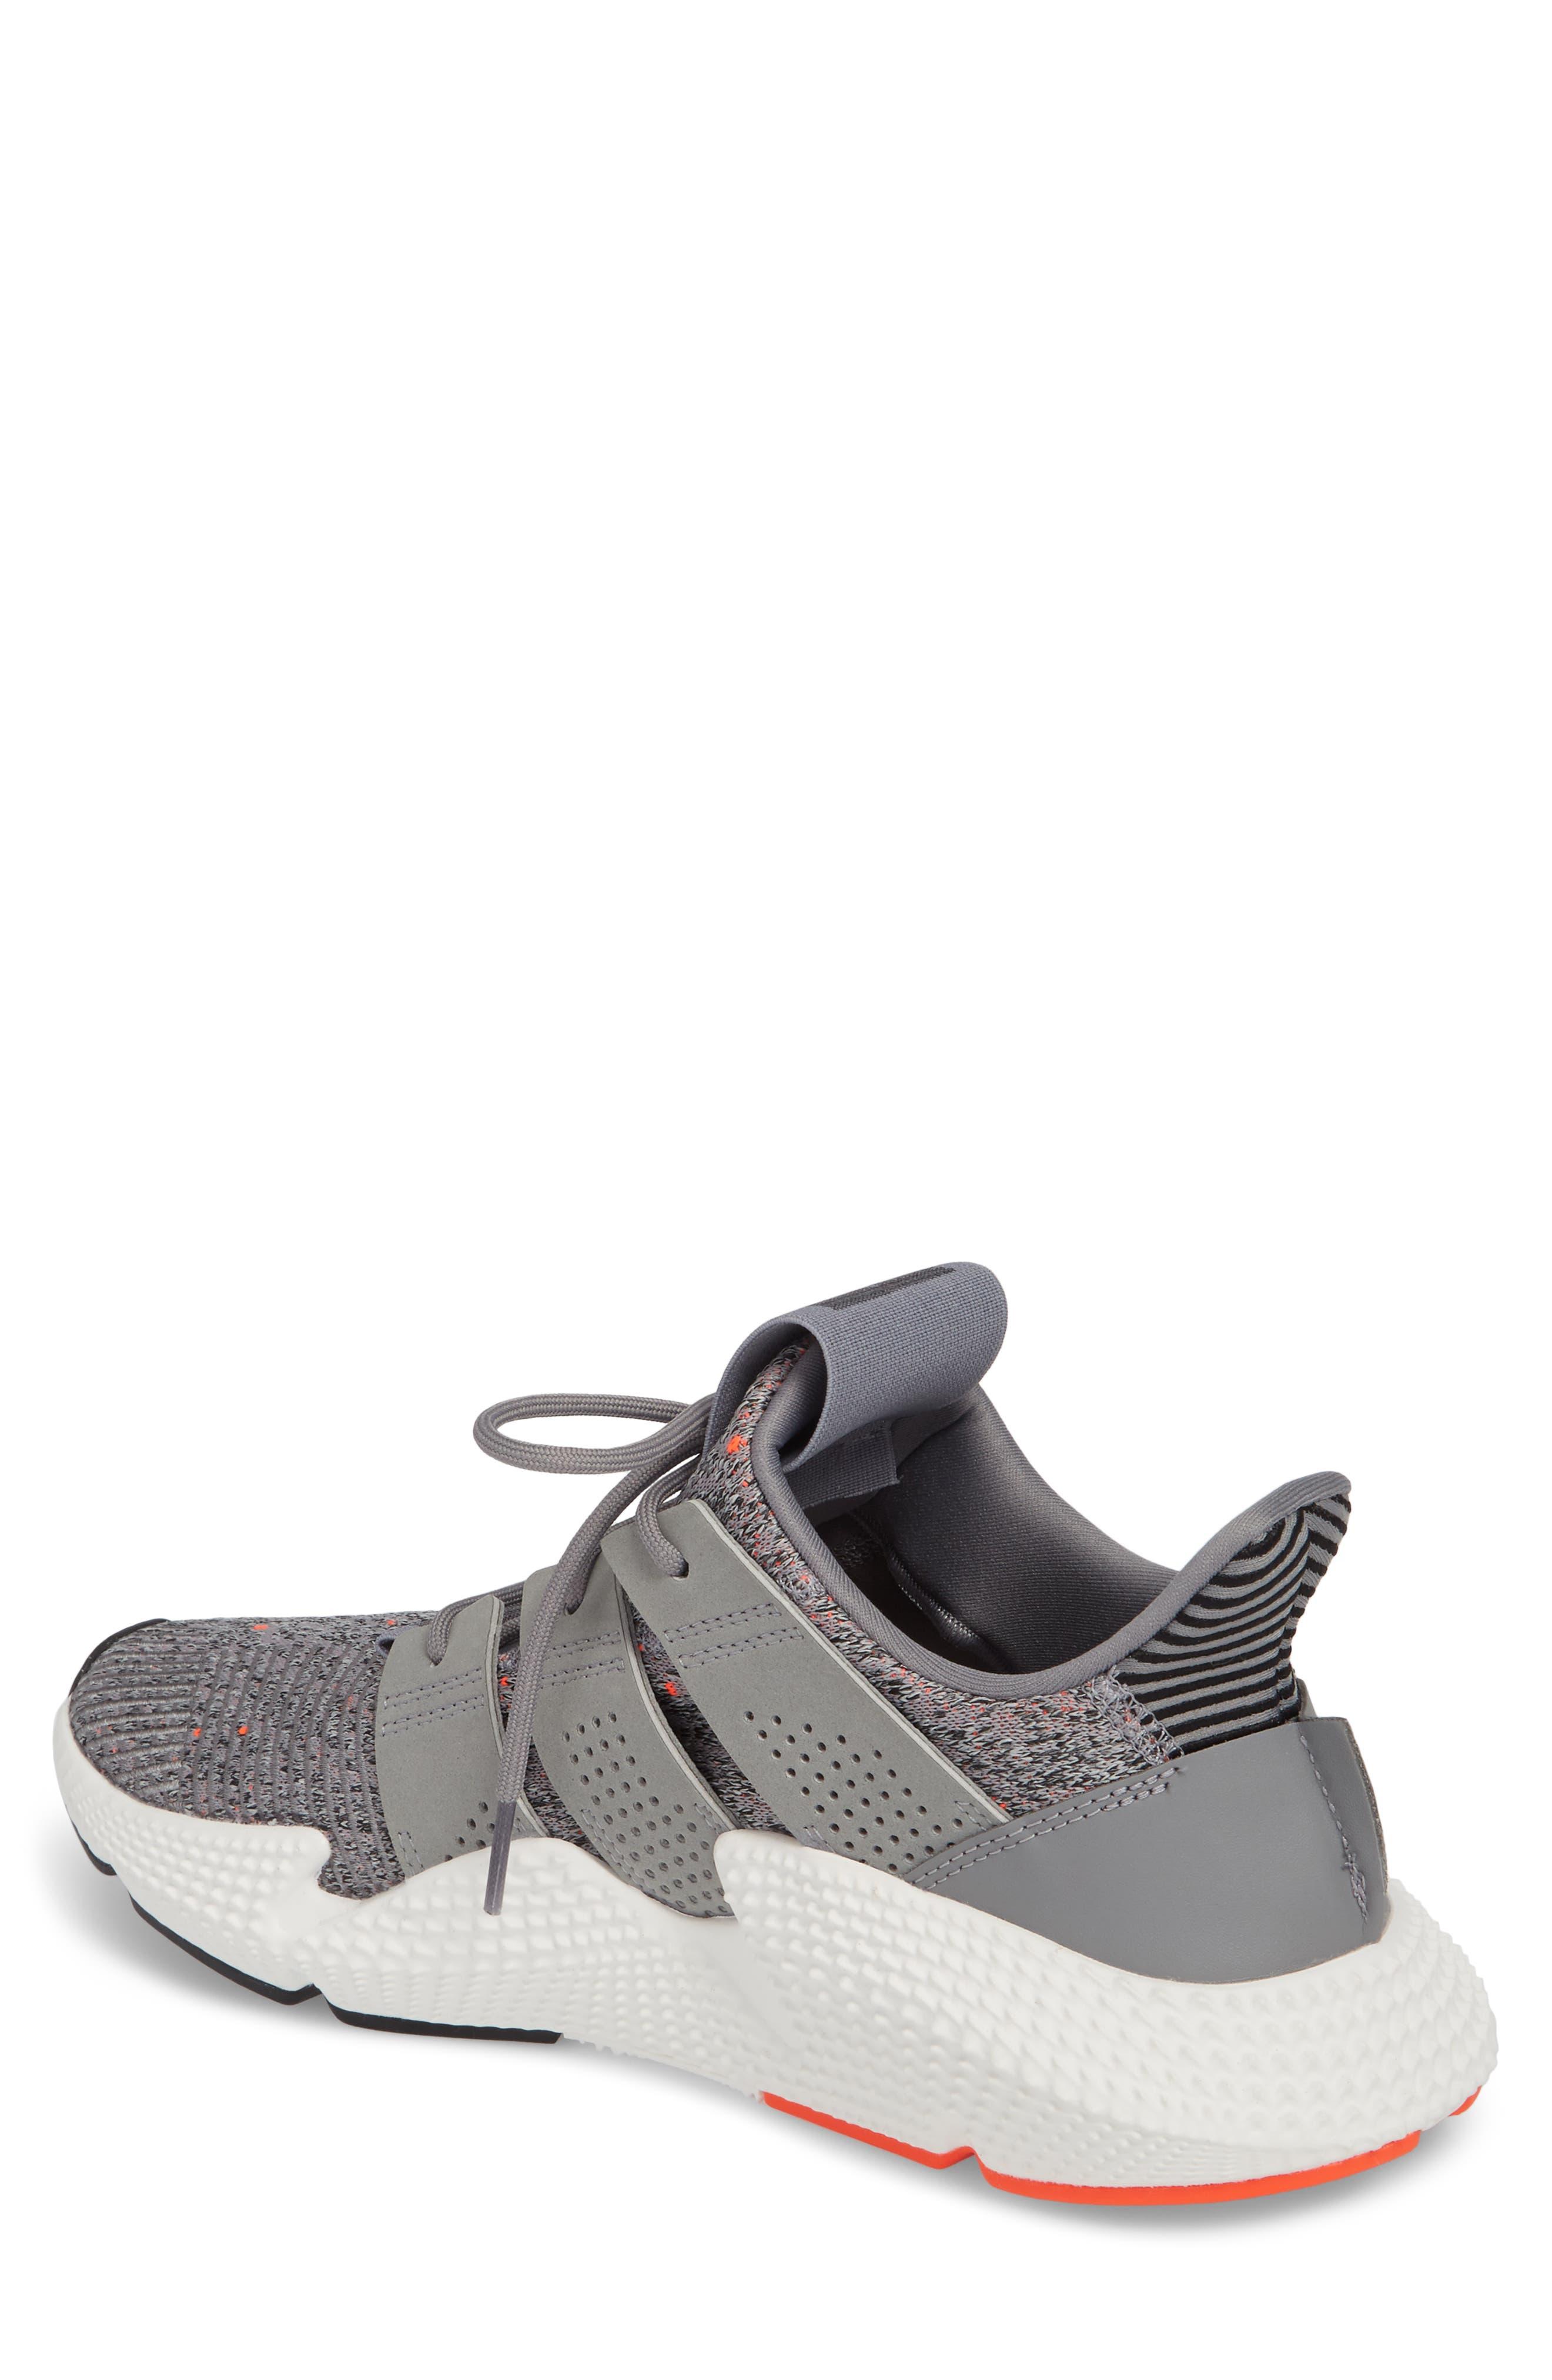 Prophere Sneaker,                             Alternate thumbnail 2, color,                             Grey/ White/ Solar Red